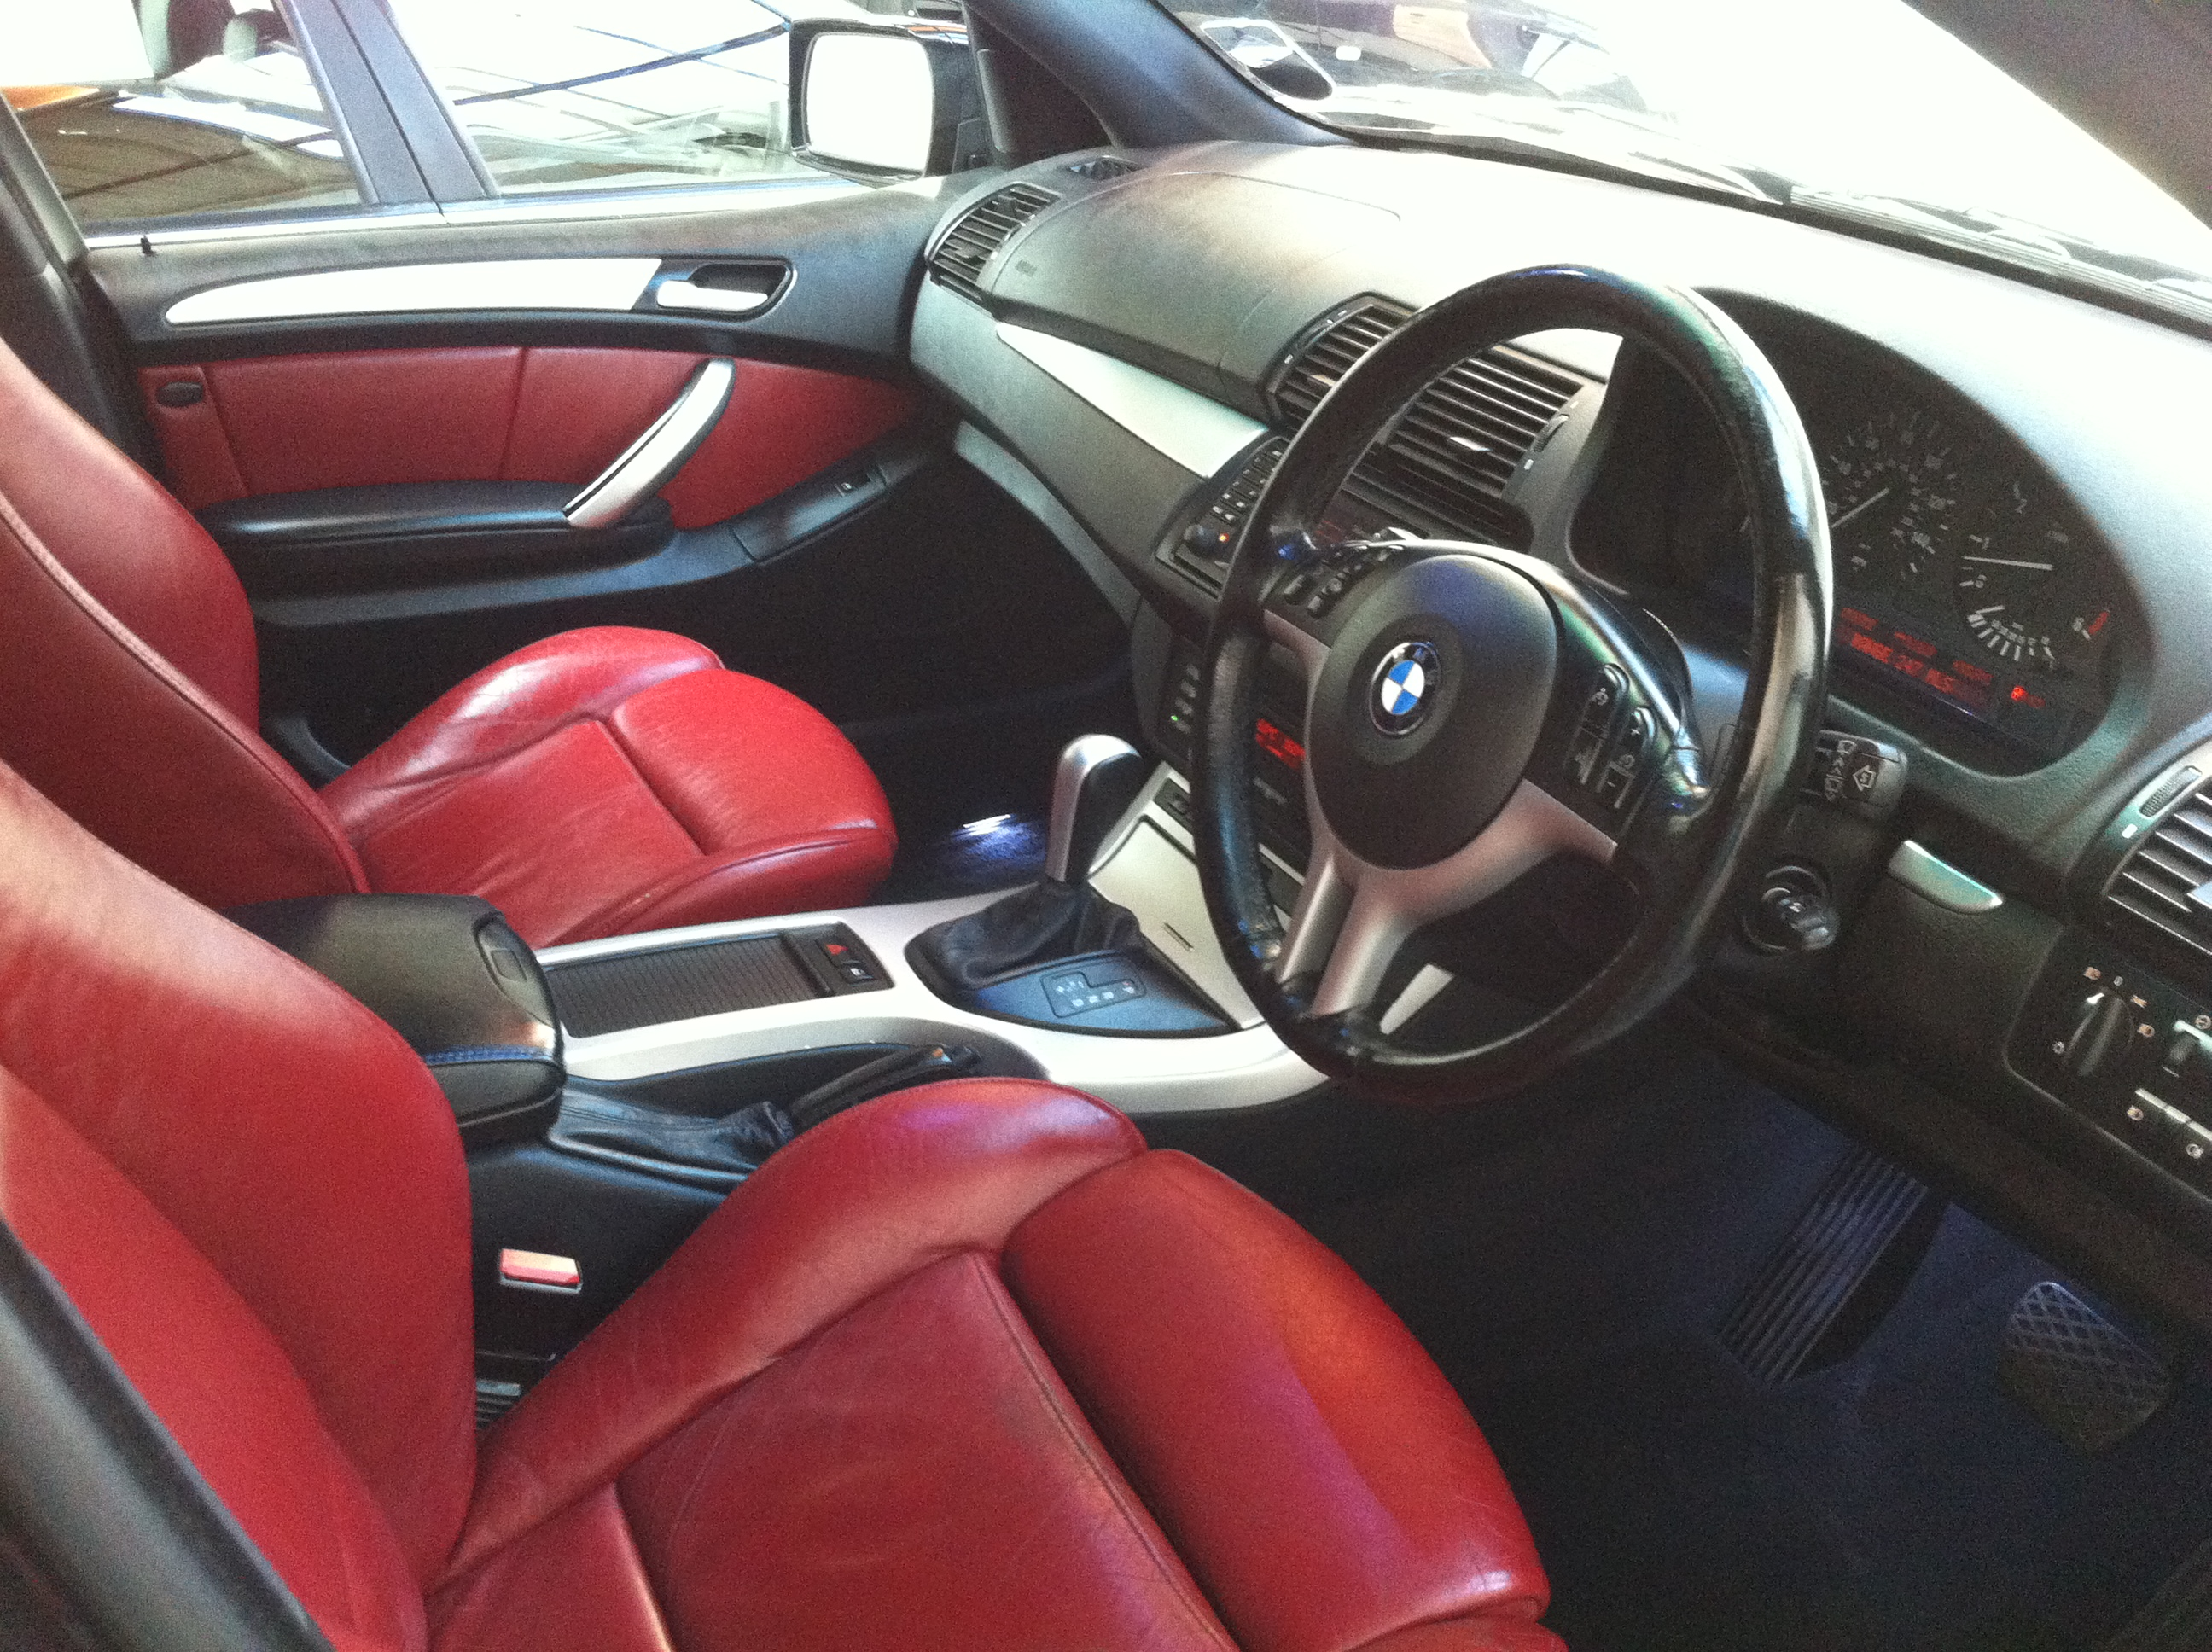 bmw x5 3 0d sport 5dr auto navigation red leather 22 khan alloys fsh tj sports and prestige. Black Bedroom Furniture Sets. Home Design Ideas